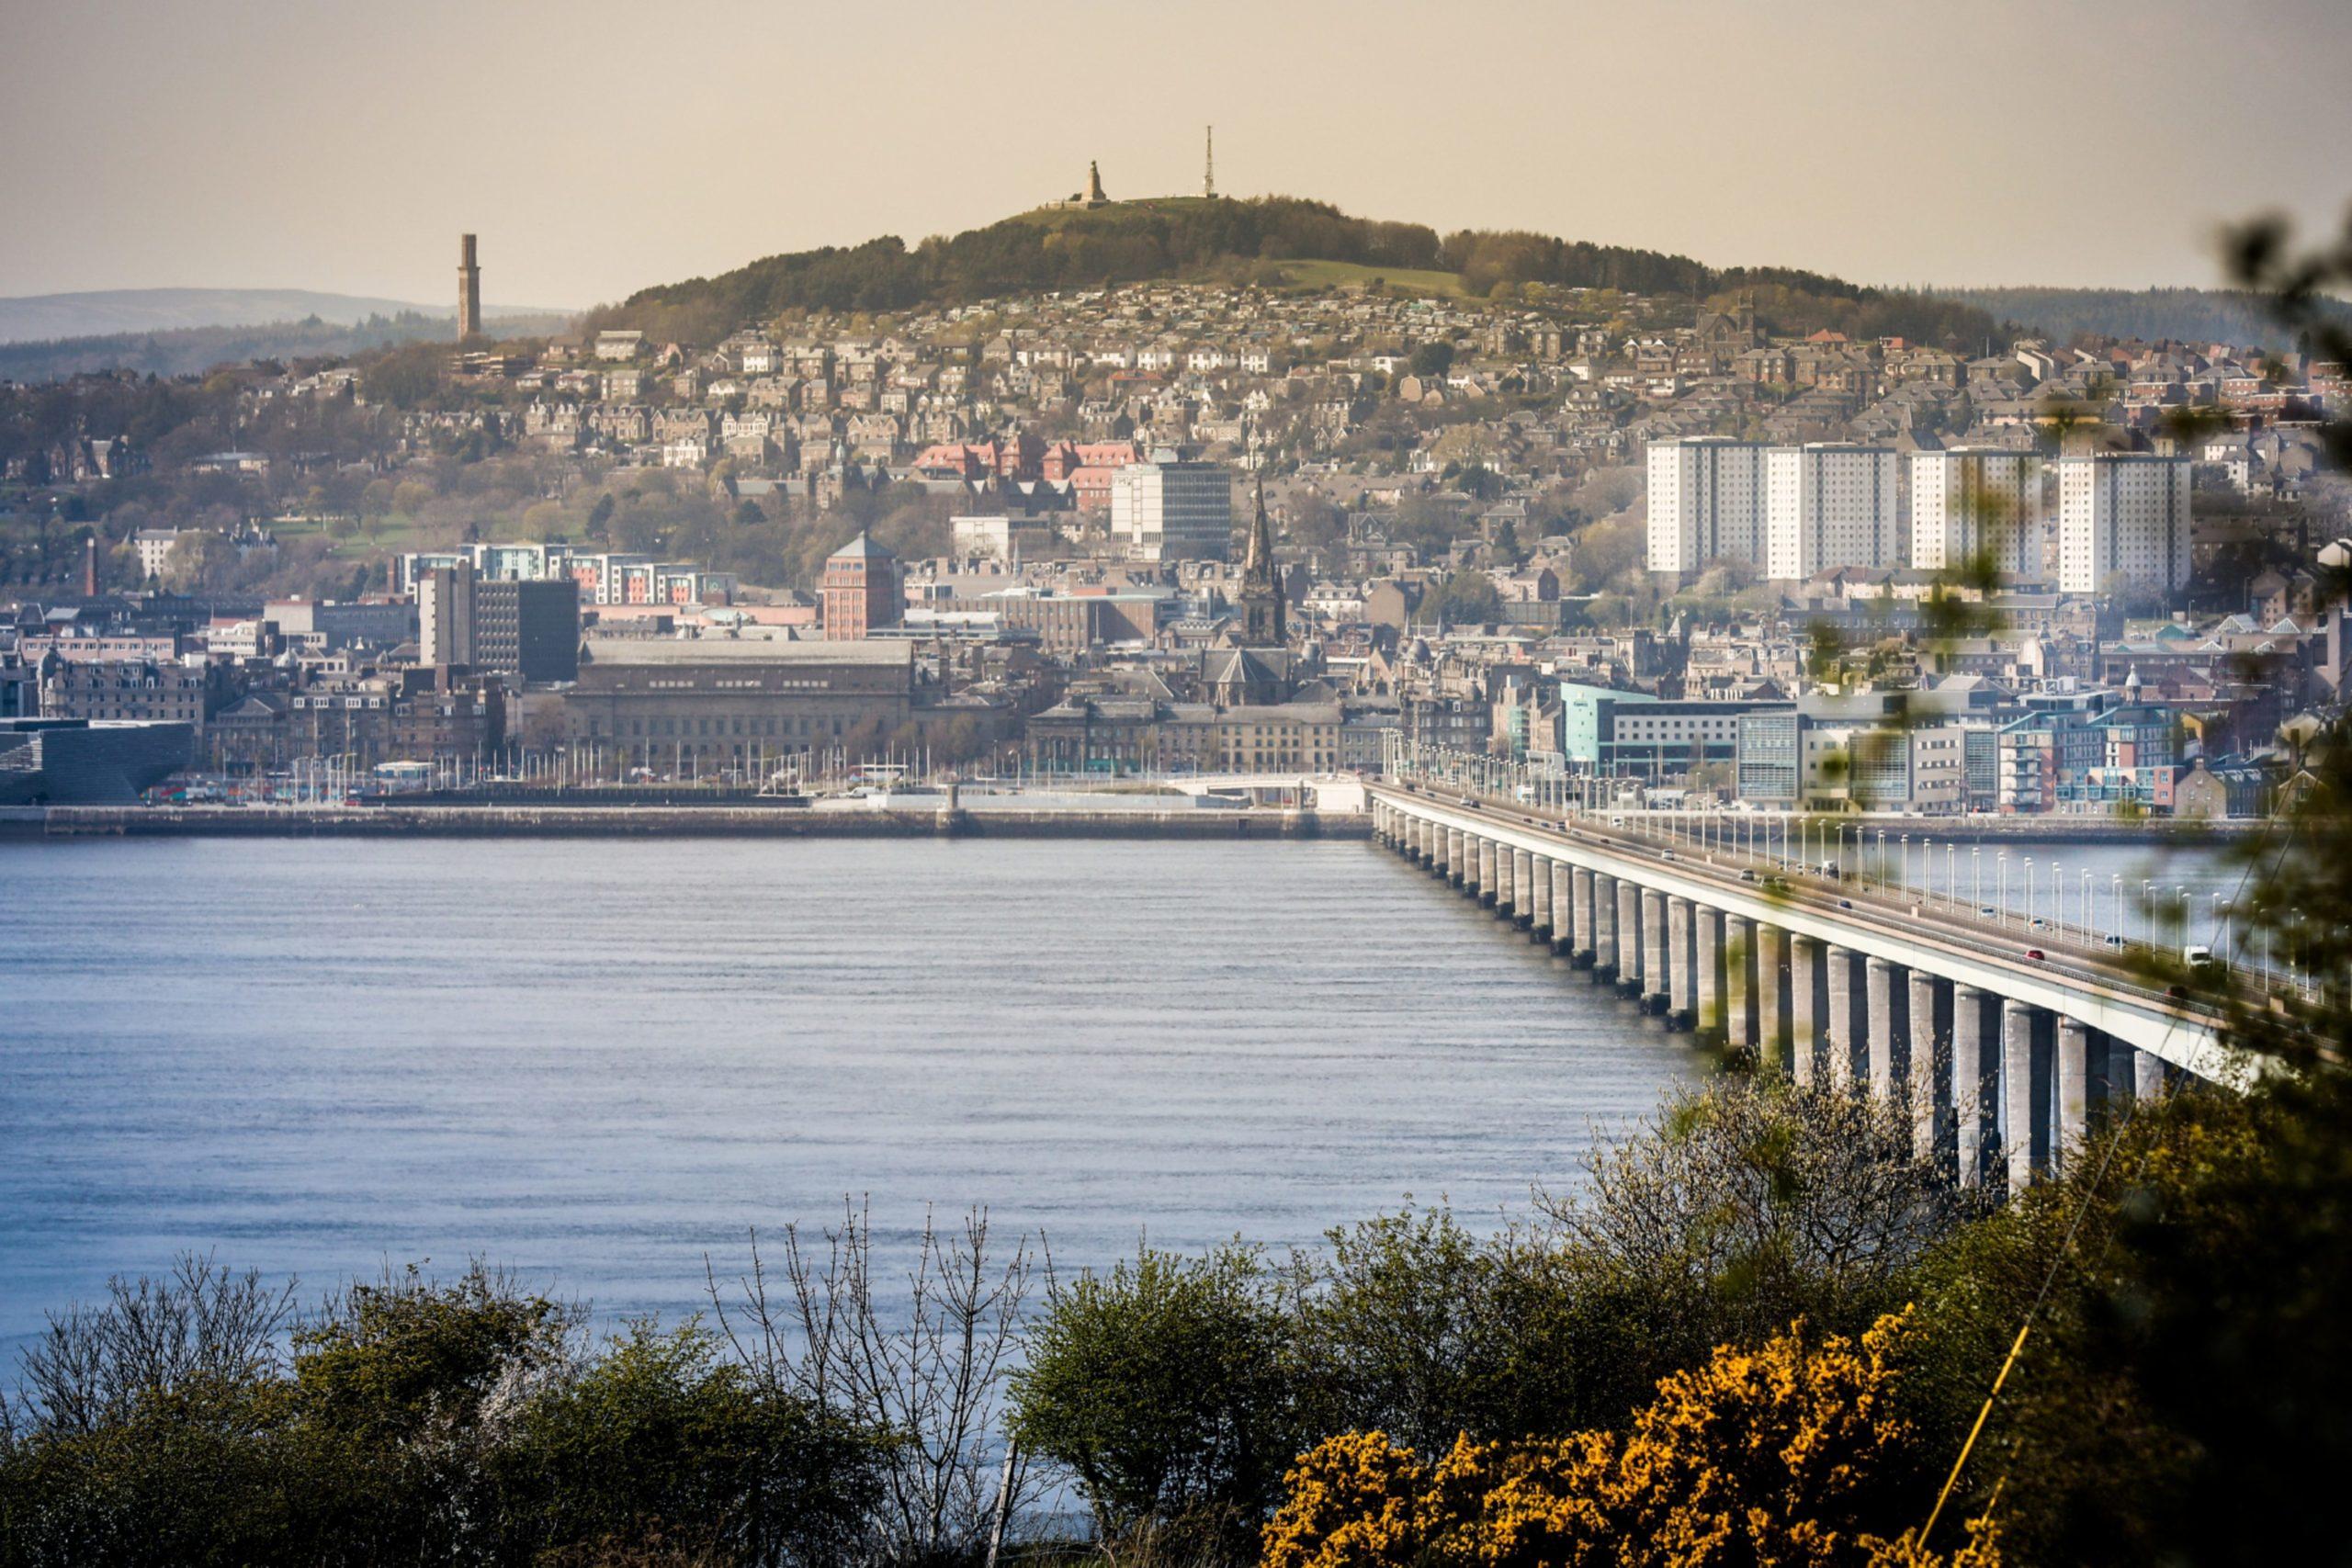 The Tay Bridge (stock image).